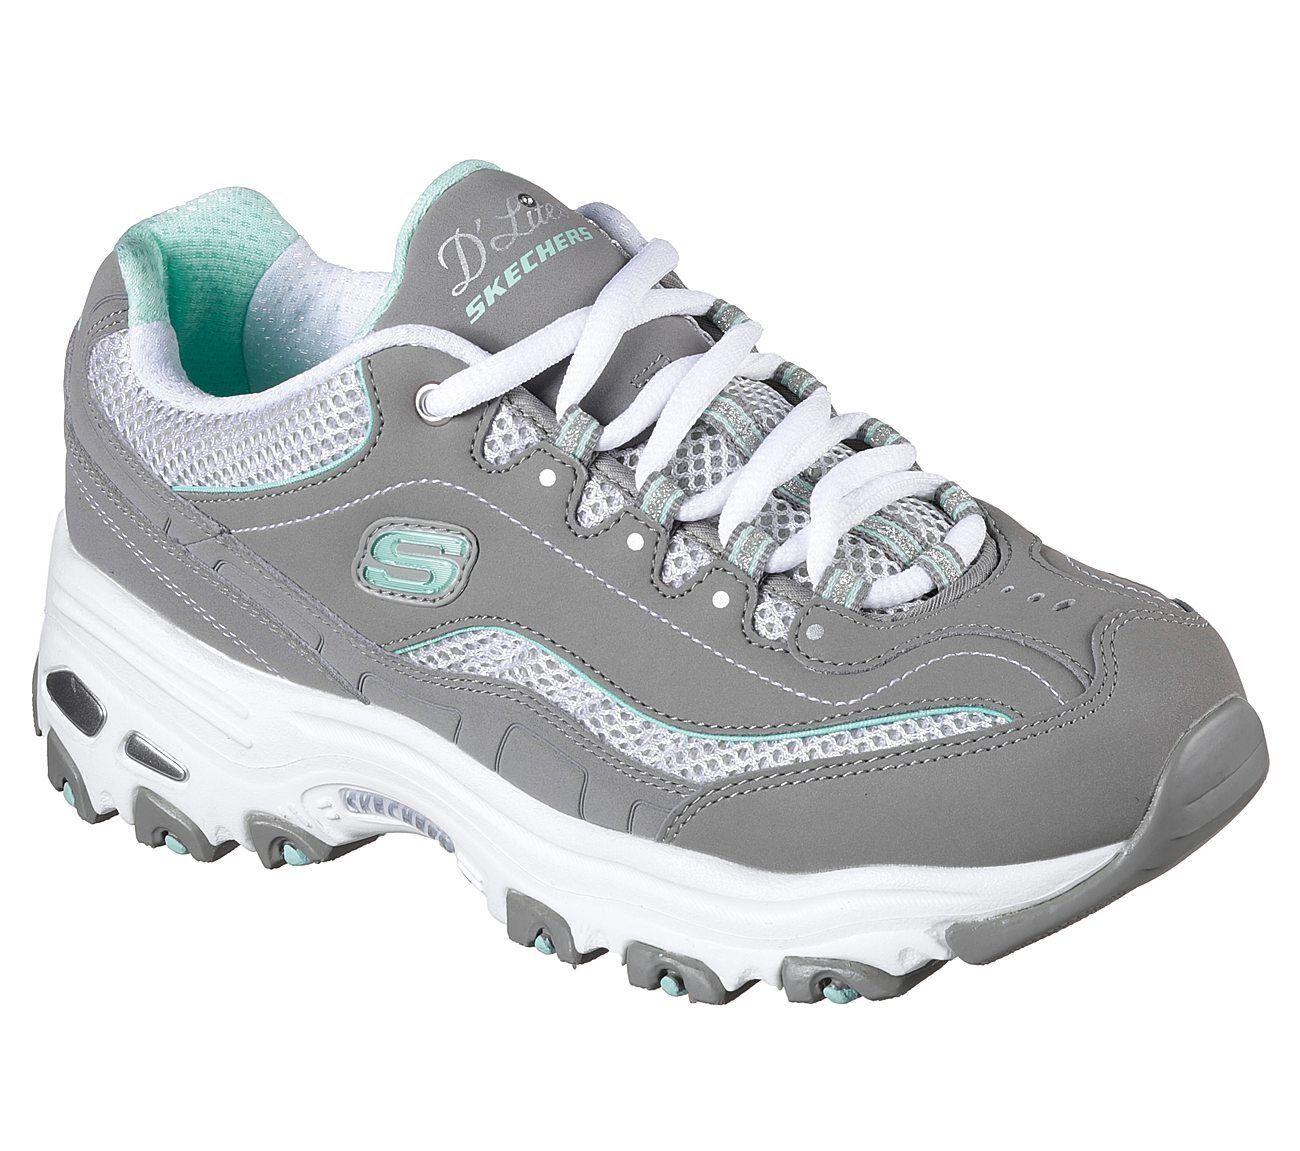 11860 Gray Dlites Skechers schuhe Damens Sport Comfort Casual Soft Memory Foam NEU